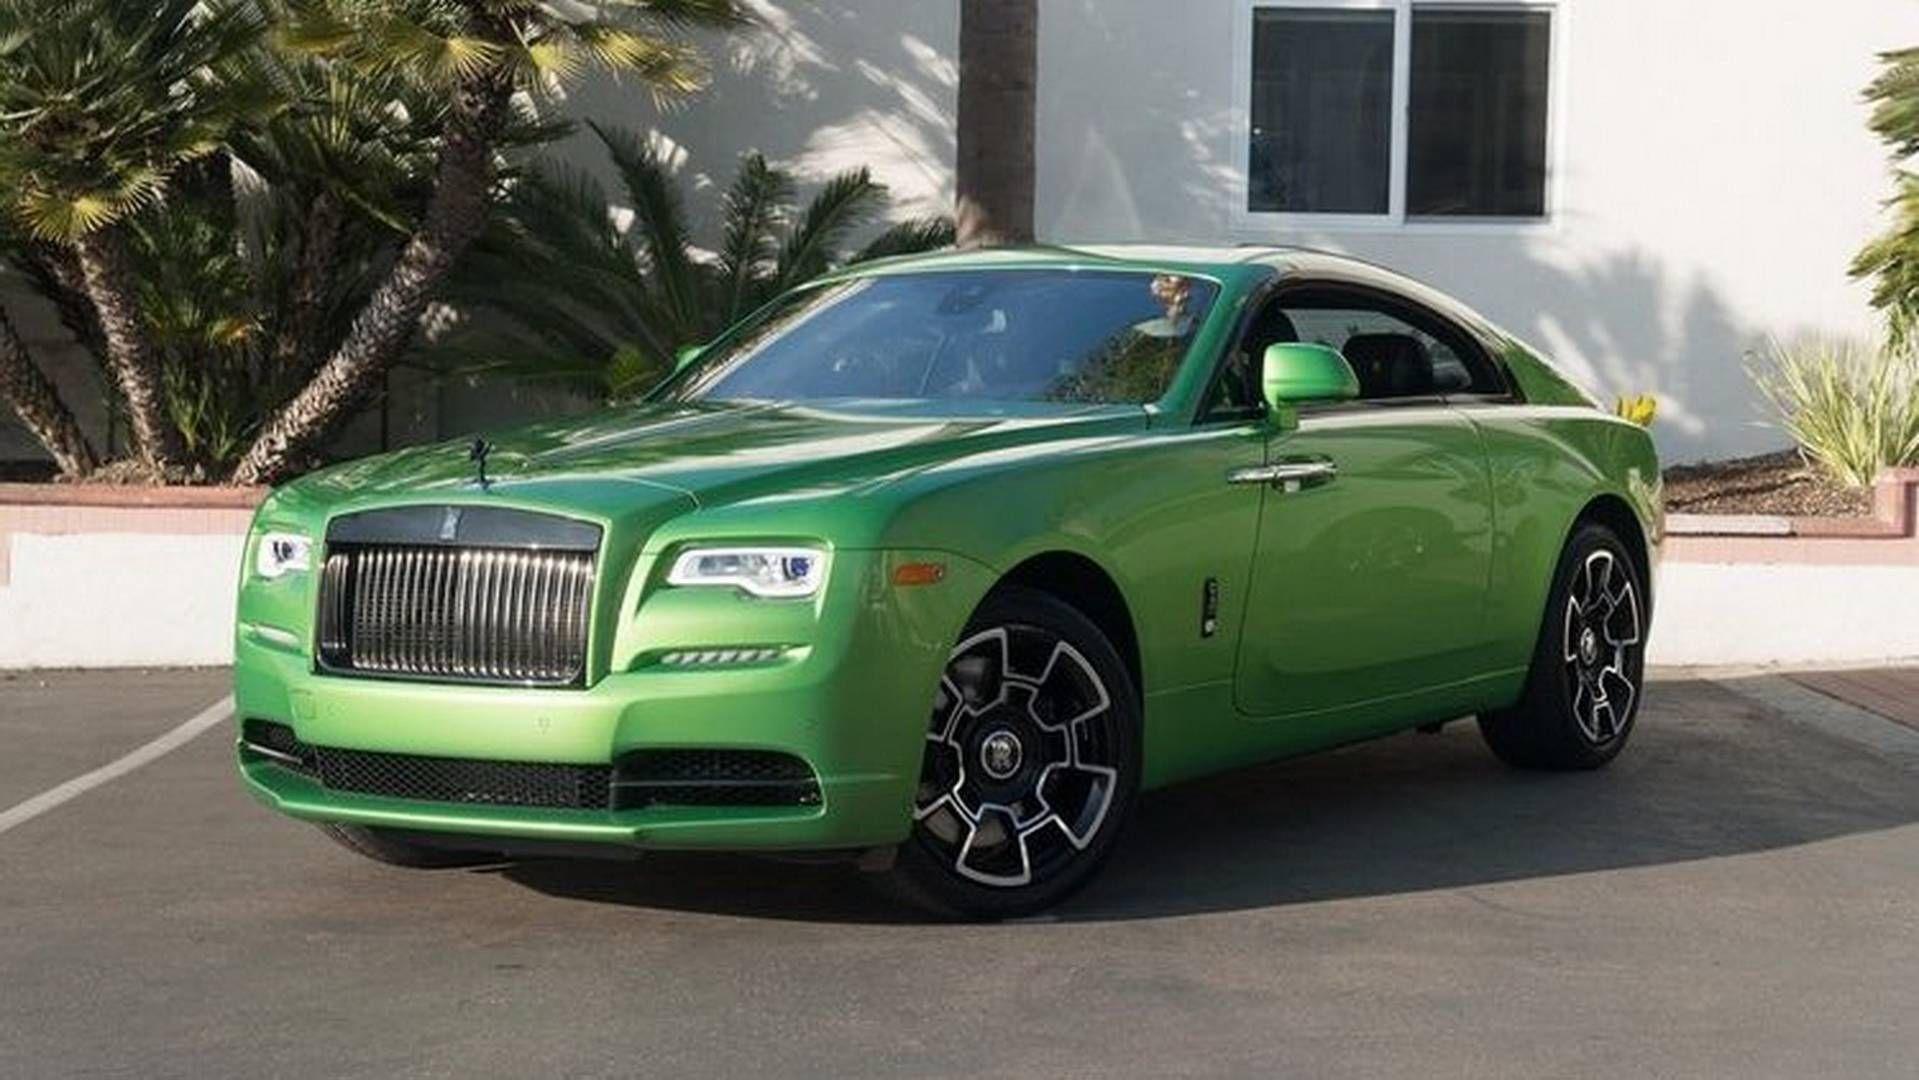 Rolls Royce Wrait Verde | Club Privado Caballeros